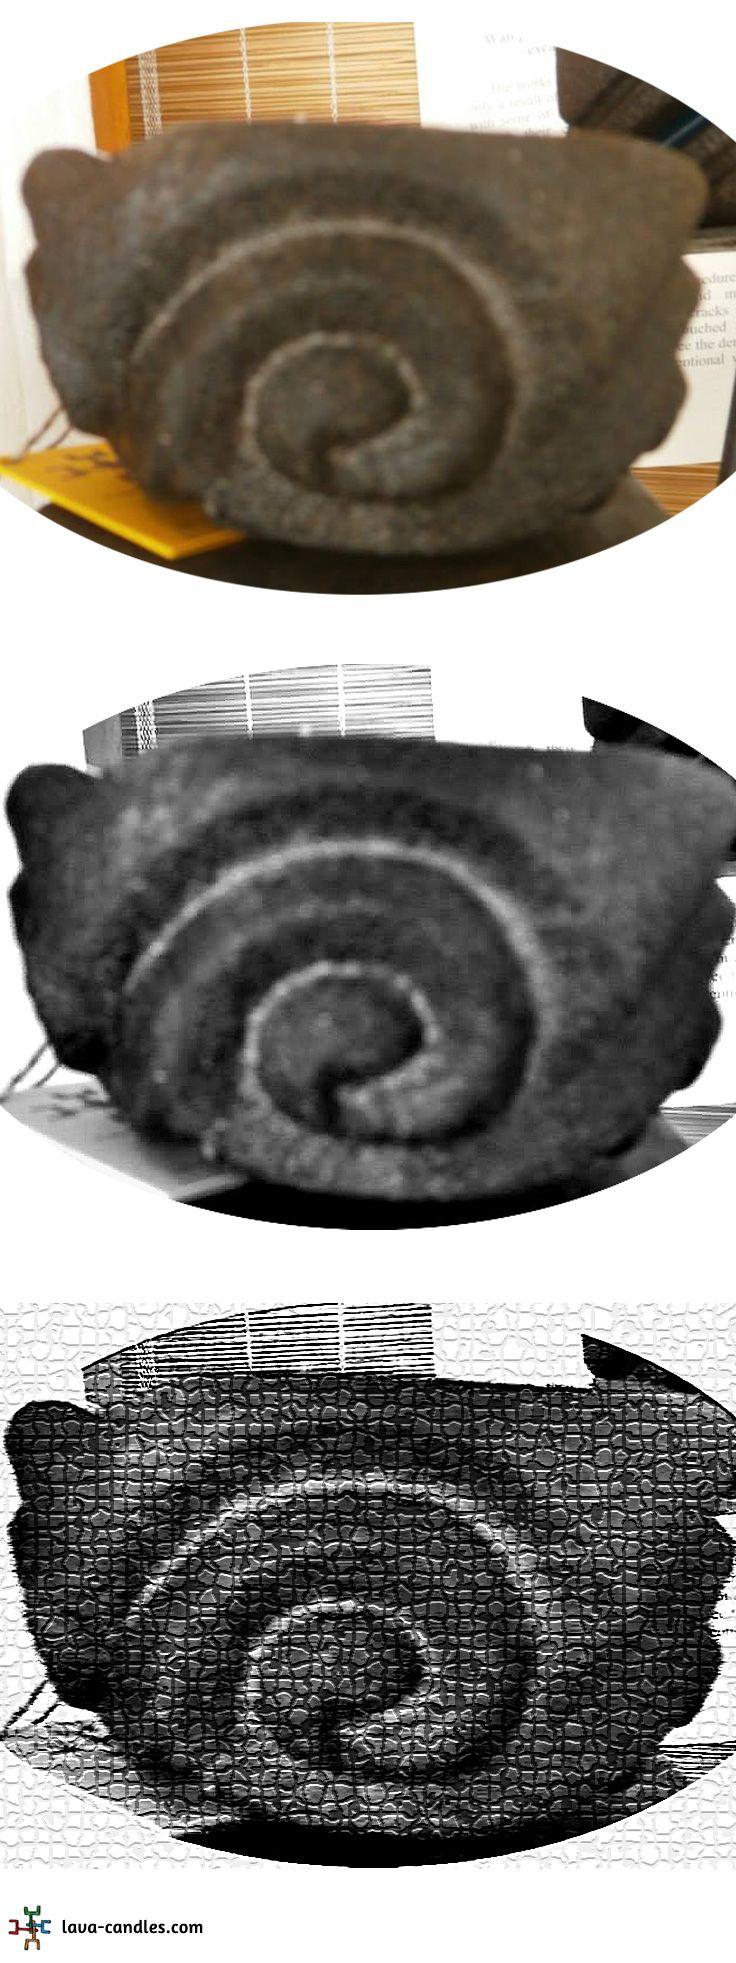 Handgefertigte Lavakerze / Duftkerze SCHWEIF // lava candle TAIL  #lavacandle #lavakerze #lava #gift #geschenk #art #kunst #santorini  #handmade #handcrafted #kerze #candle #design #duftkerze #handarbeit #tail #stone #handarbeit #sculpture #skulptur